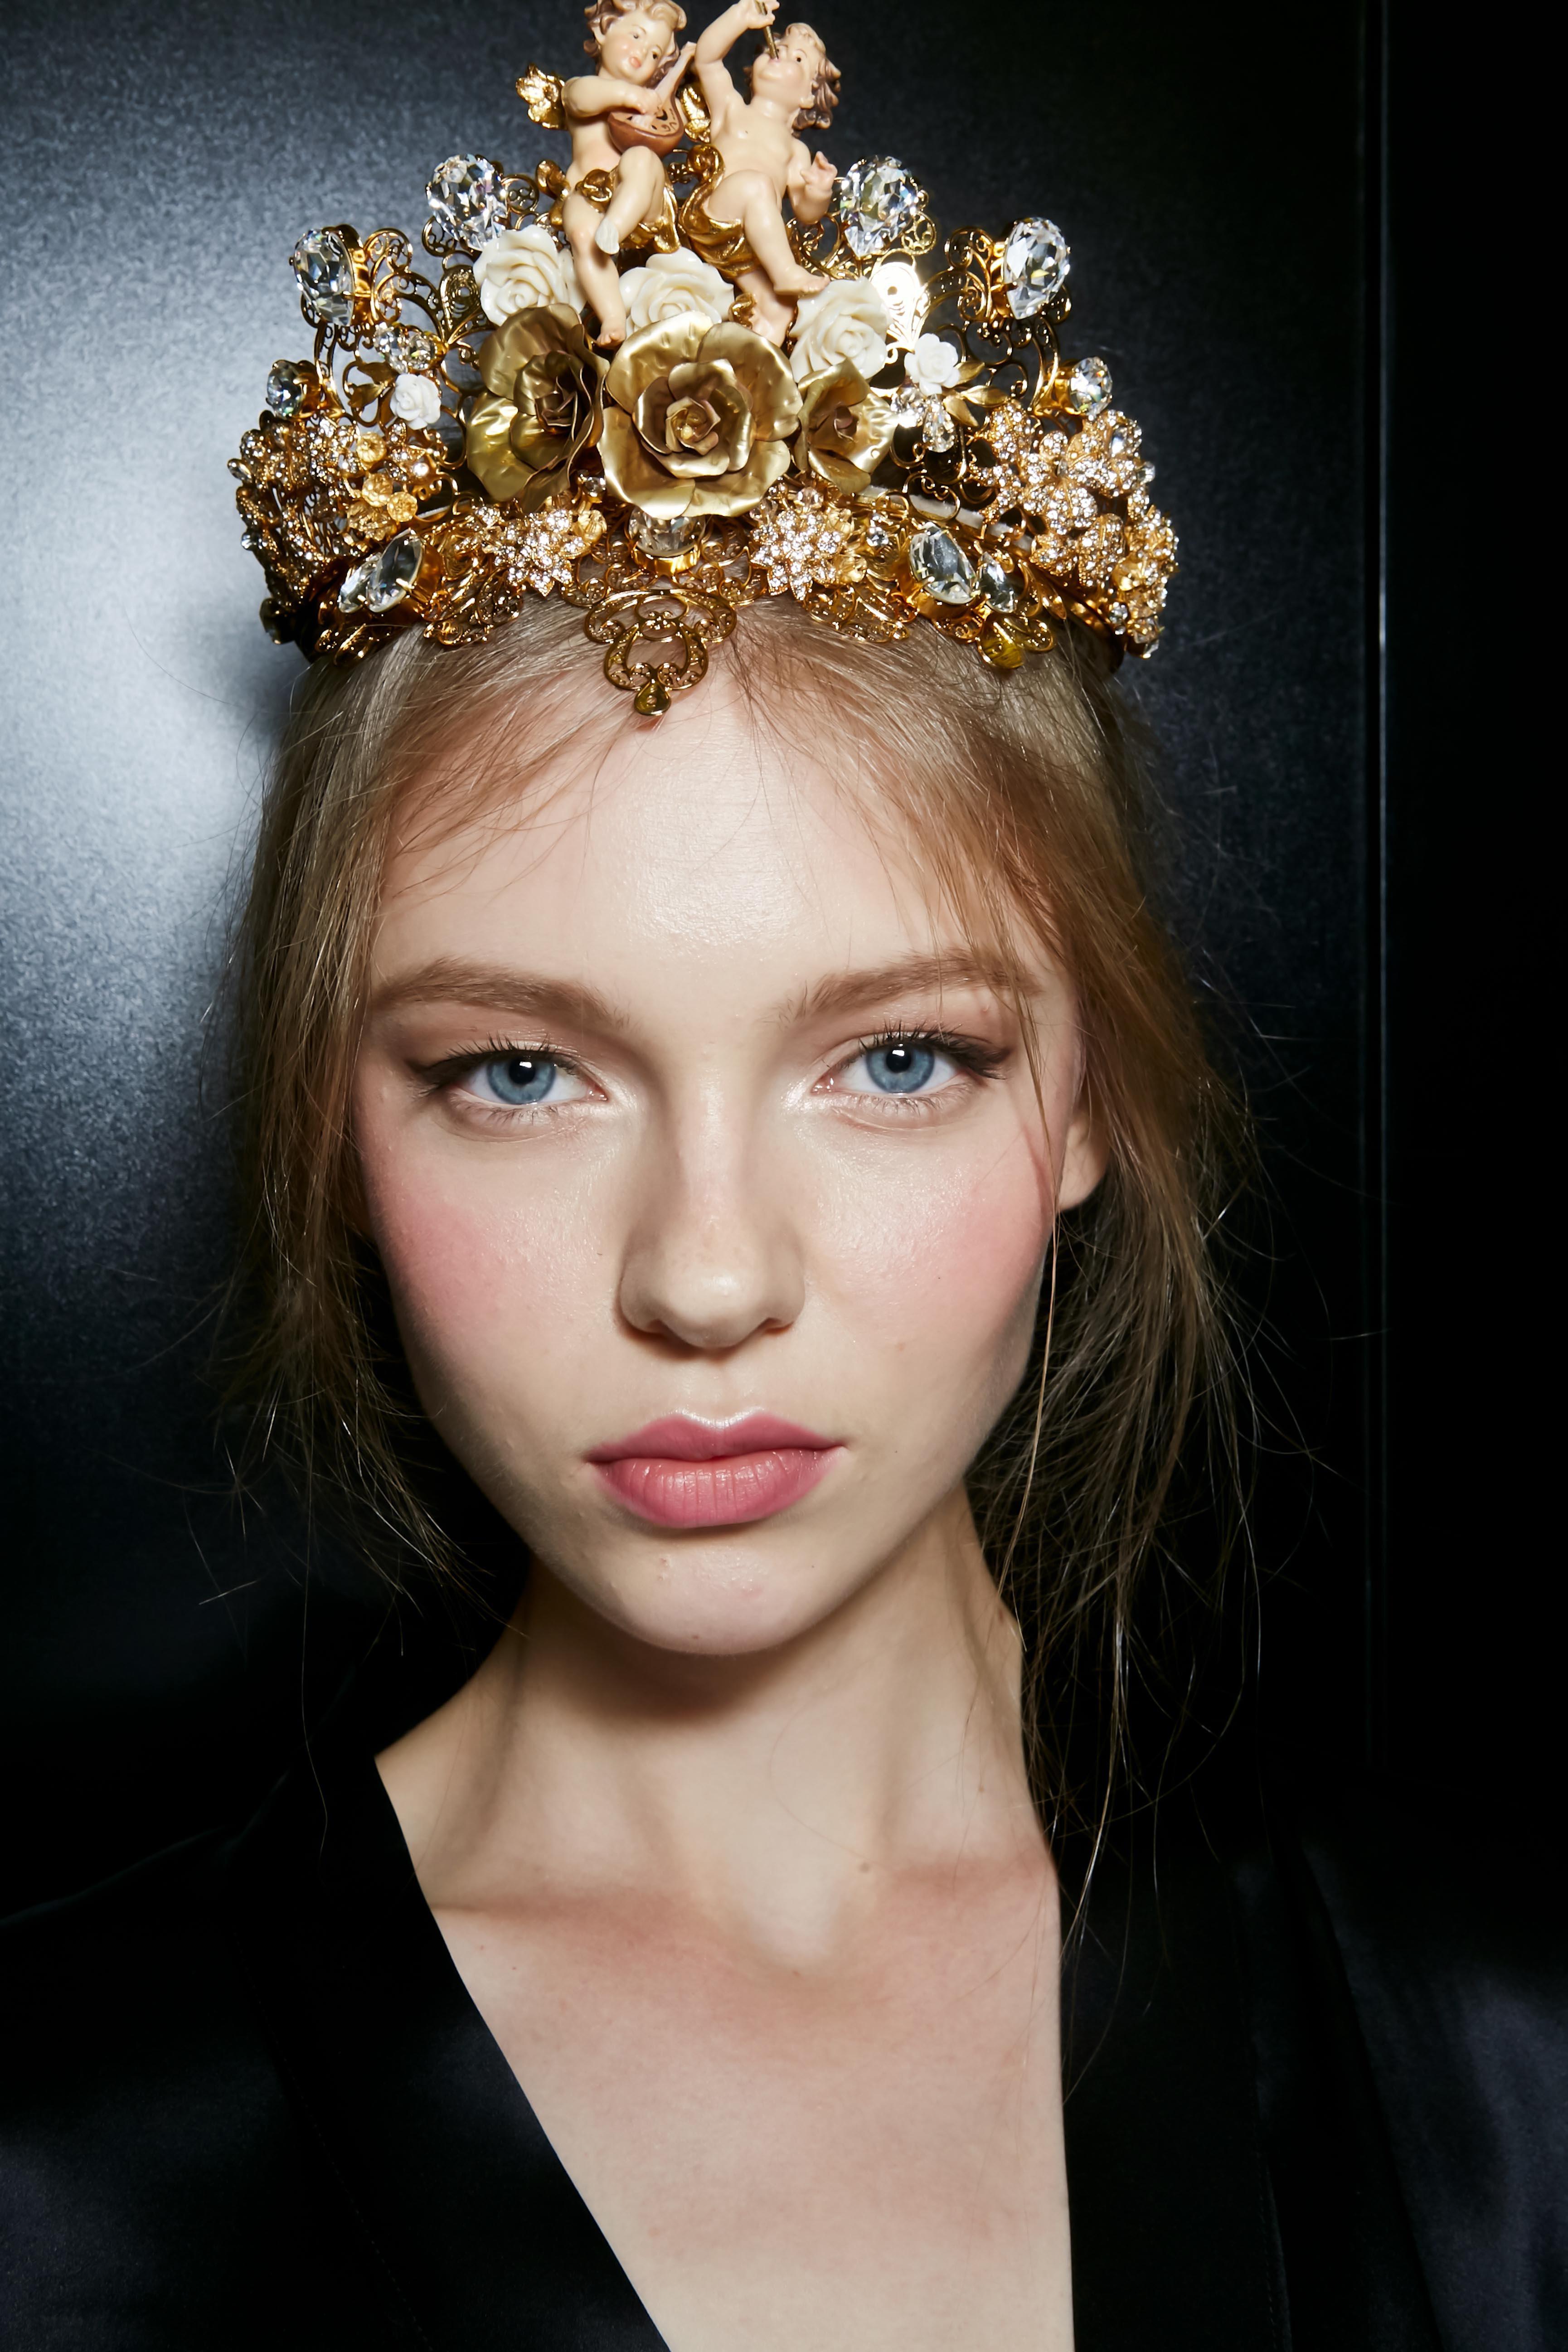 Make-up Trends 2017